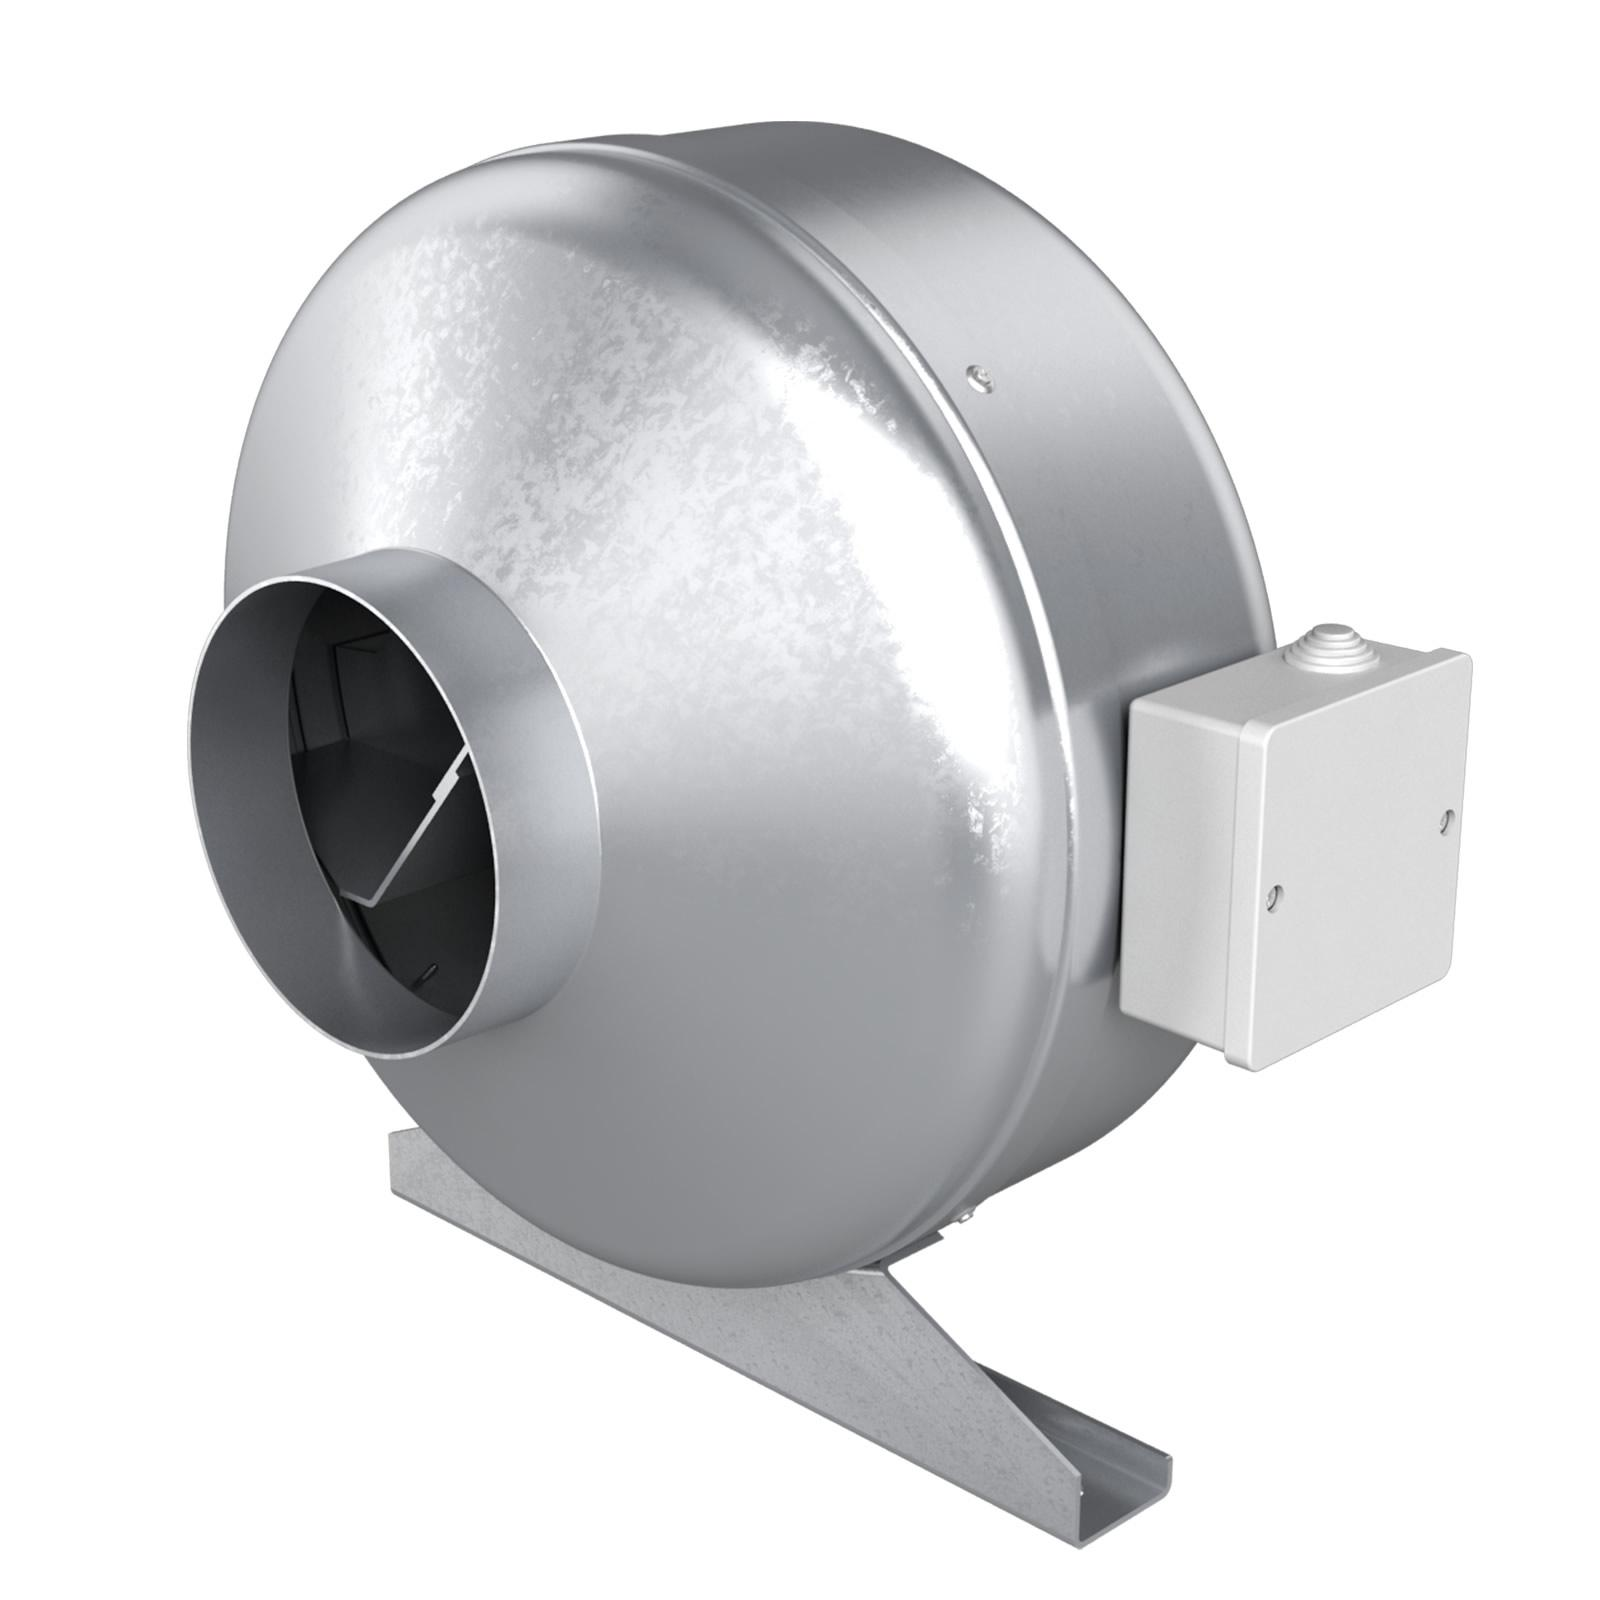 Вентилятор Era Mars gdf 125 era mars gdf 150 вентилятор центробежный канальный